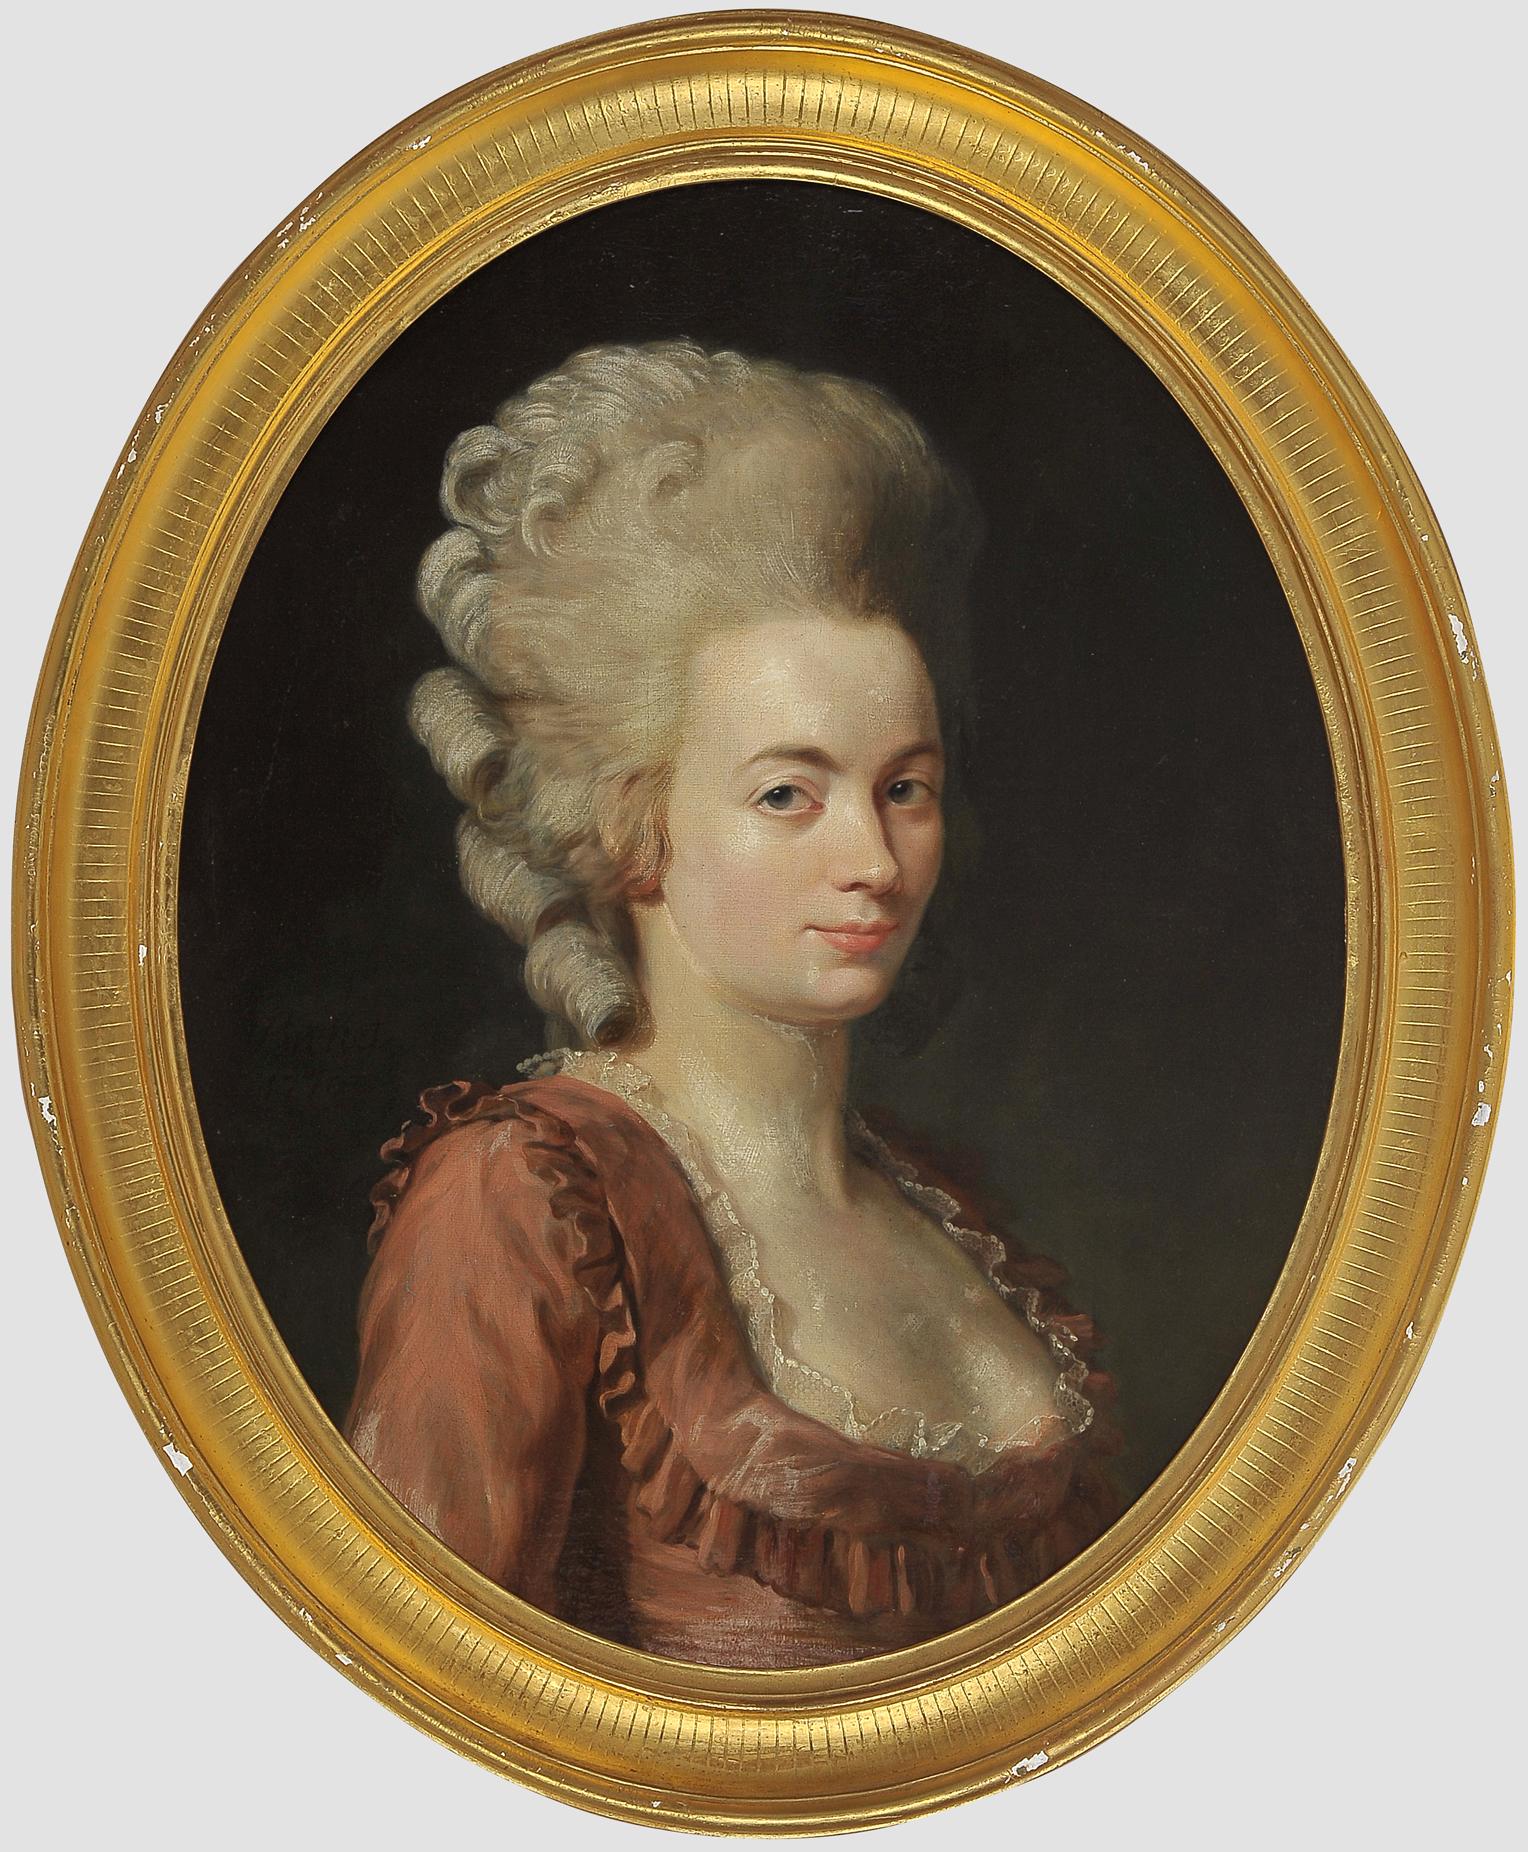 "Nicolas Guy Brenet, Paris 1728 – 1792 Paris, Portraits des Ehepaares ""Von Schauenstein"" - Image 3 of 11"